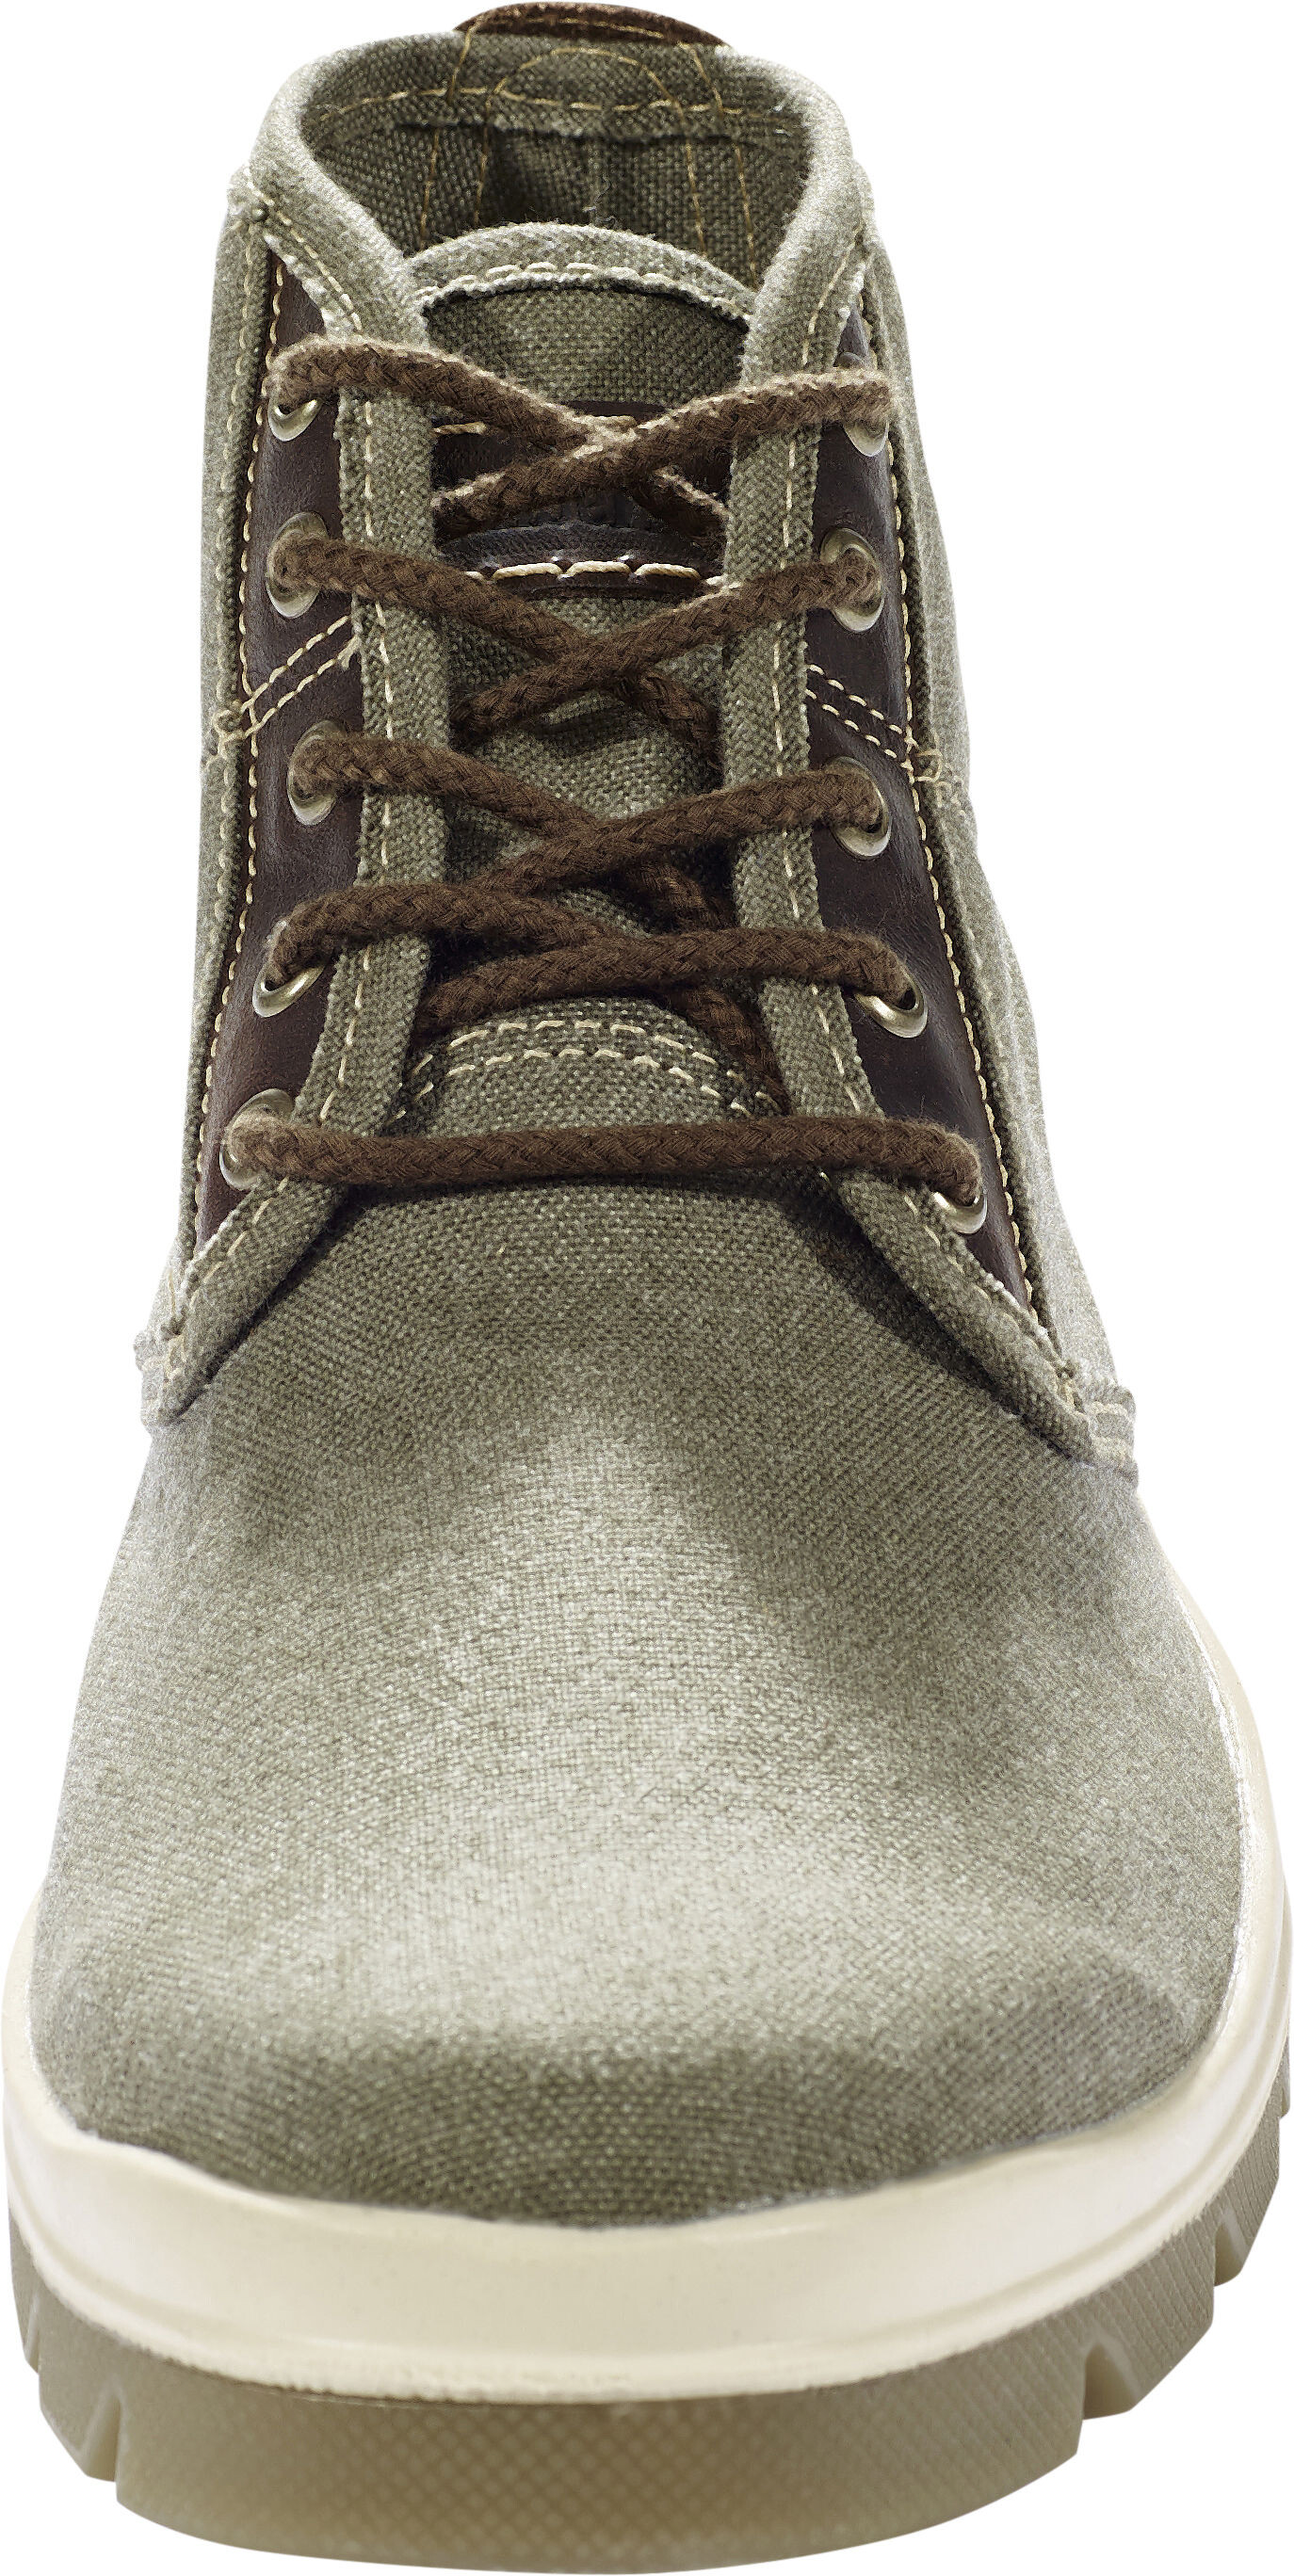 832118a48dd2 Timberland City Blazer Chukka Shoes Men olive at Addnature.co.uk